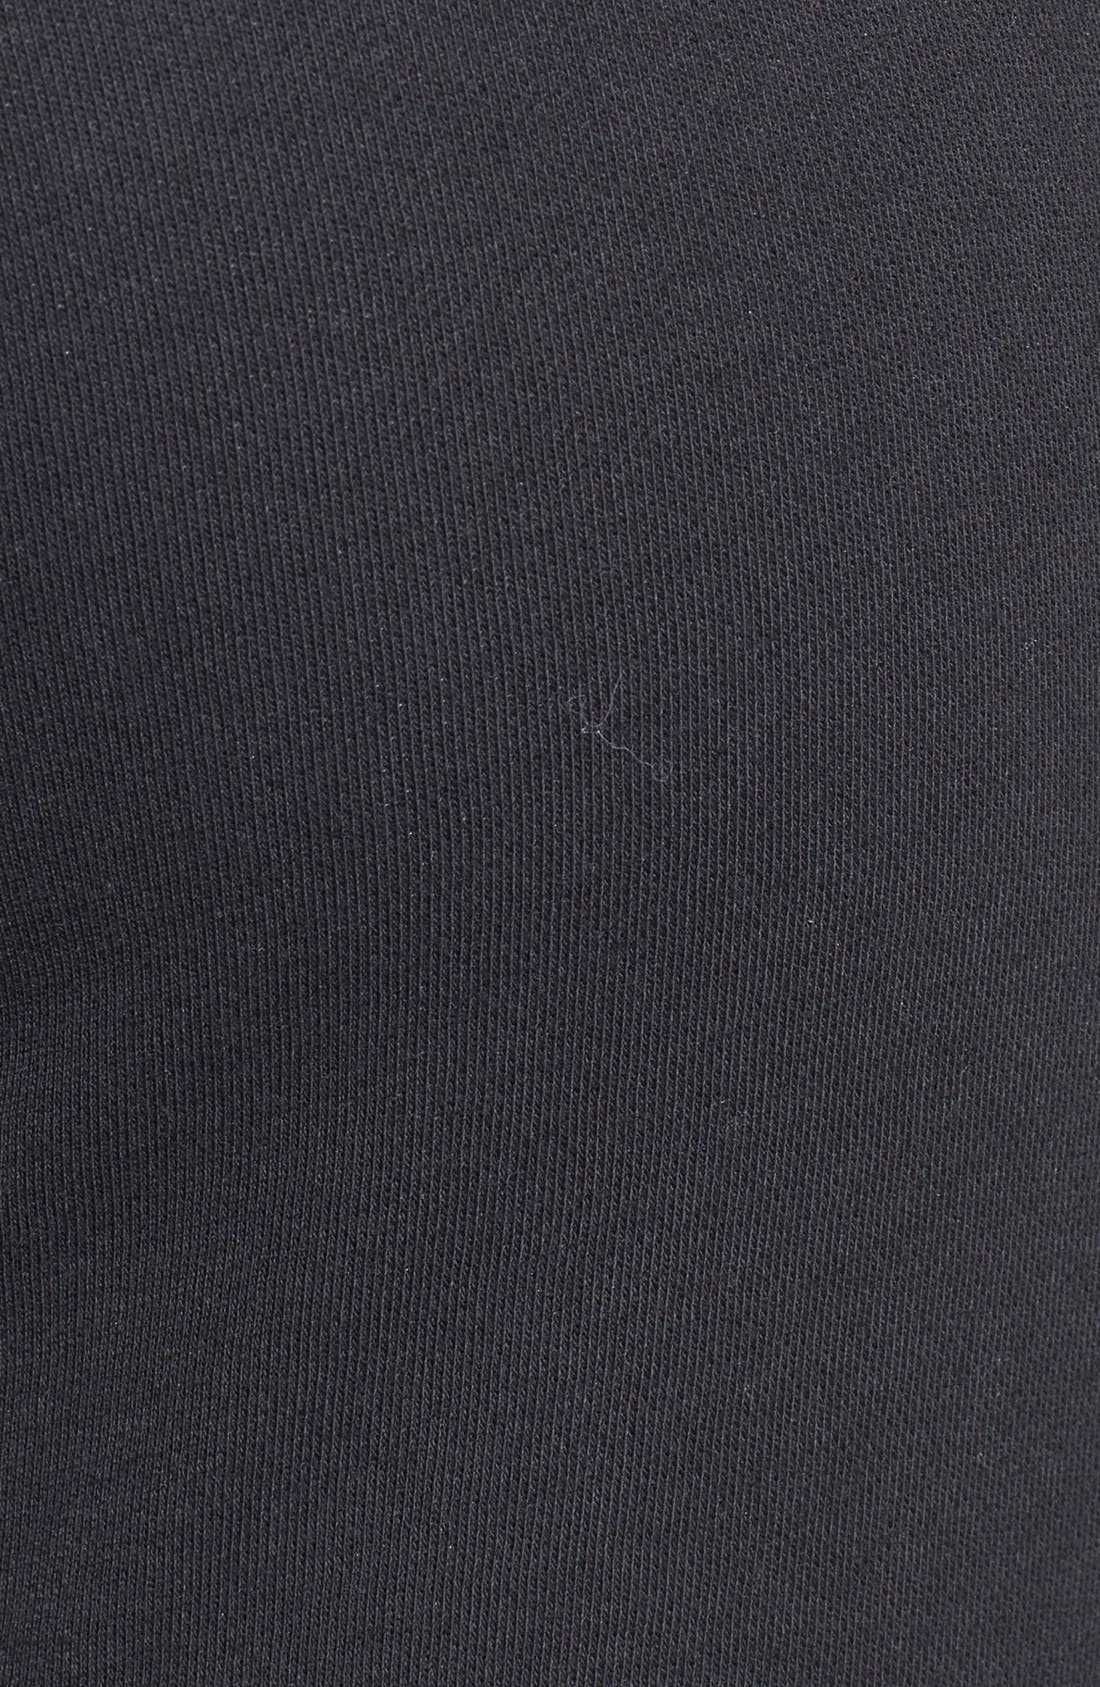 Alternate Image 3  - adidas by Stella McCartney 'Essentials' Sweatpants